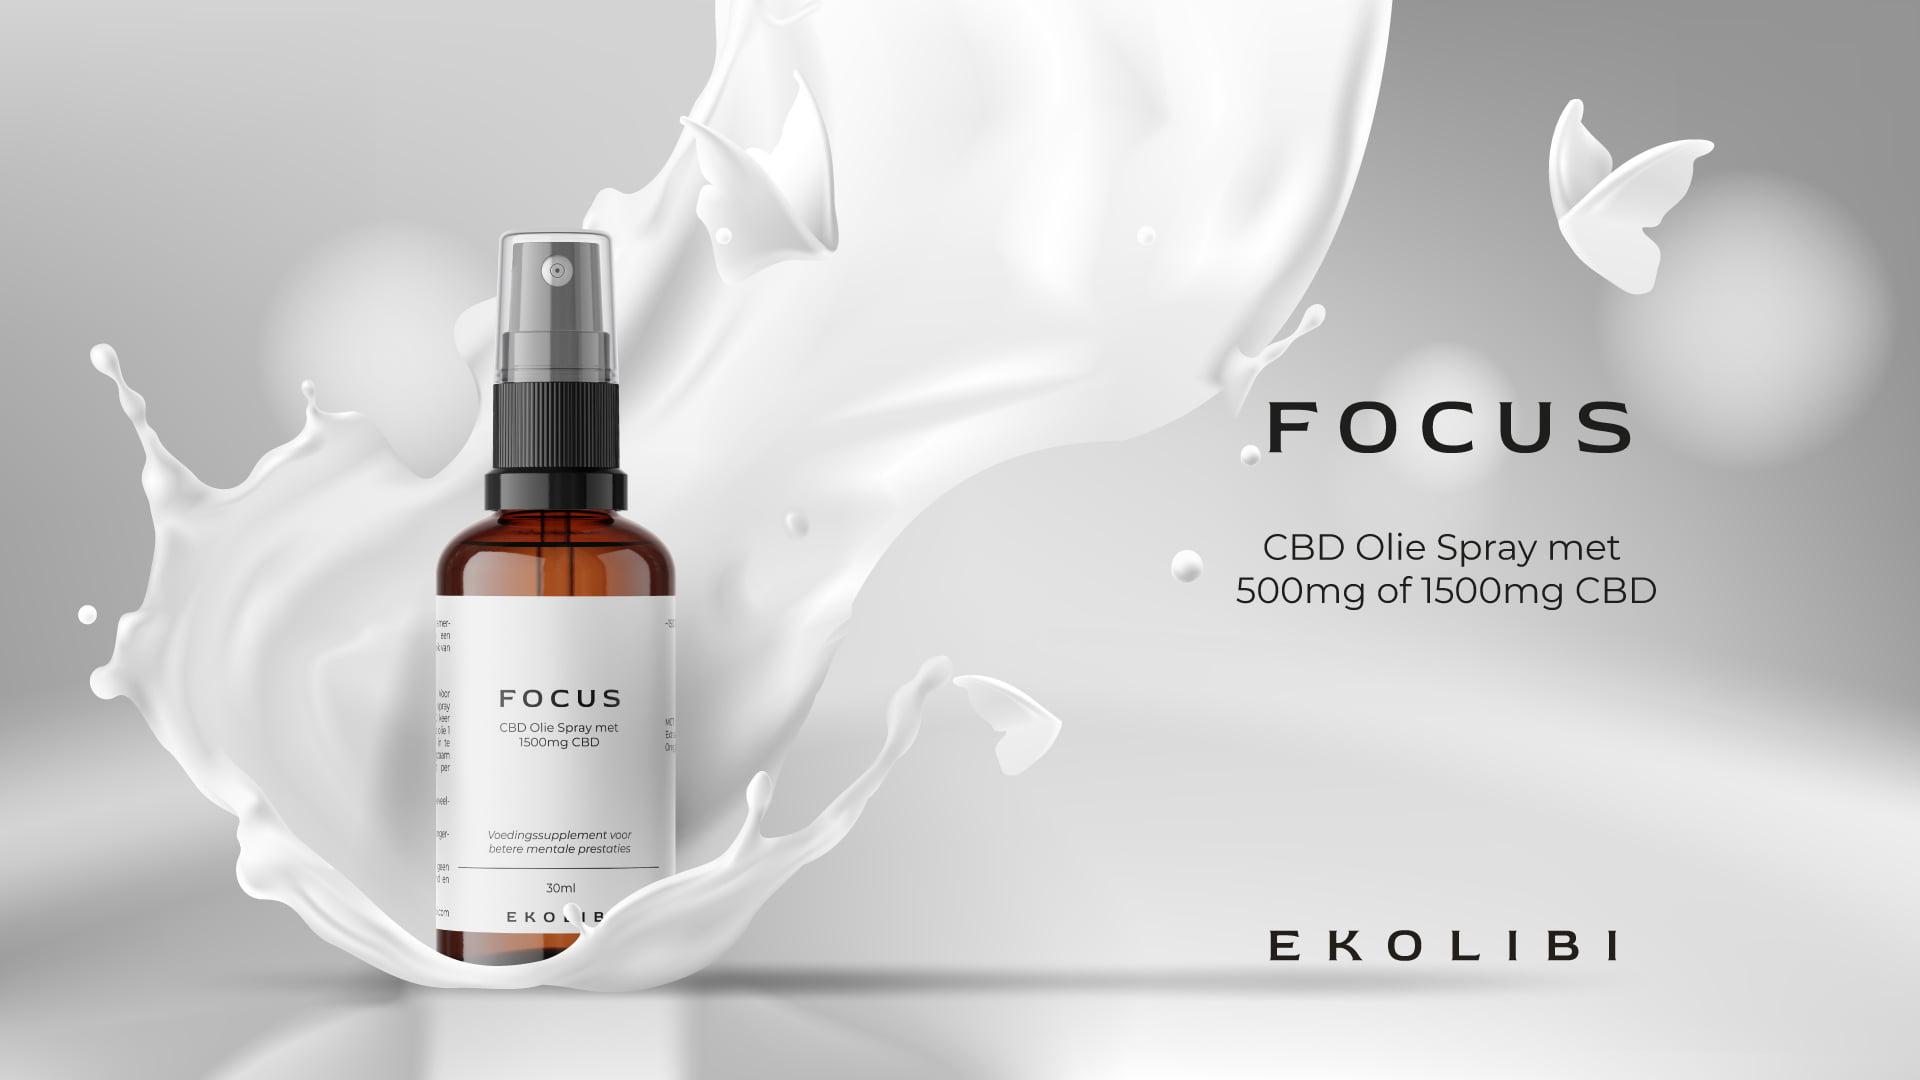 Ekolibi Focus CBD productpagina